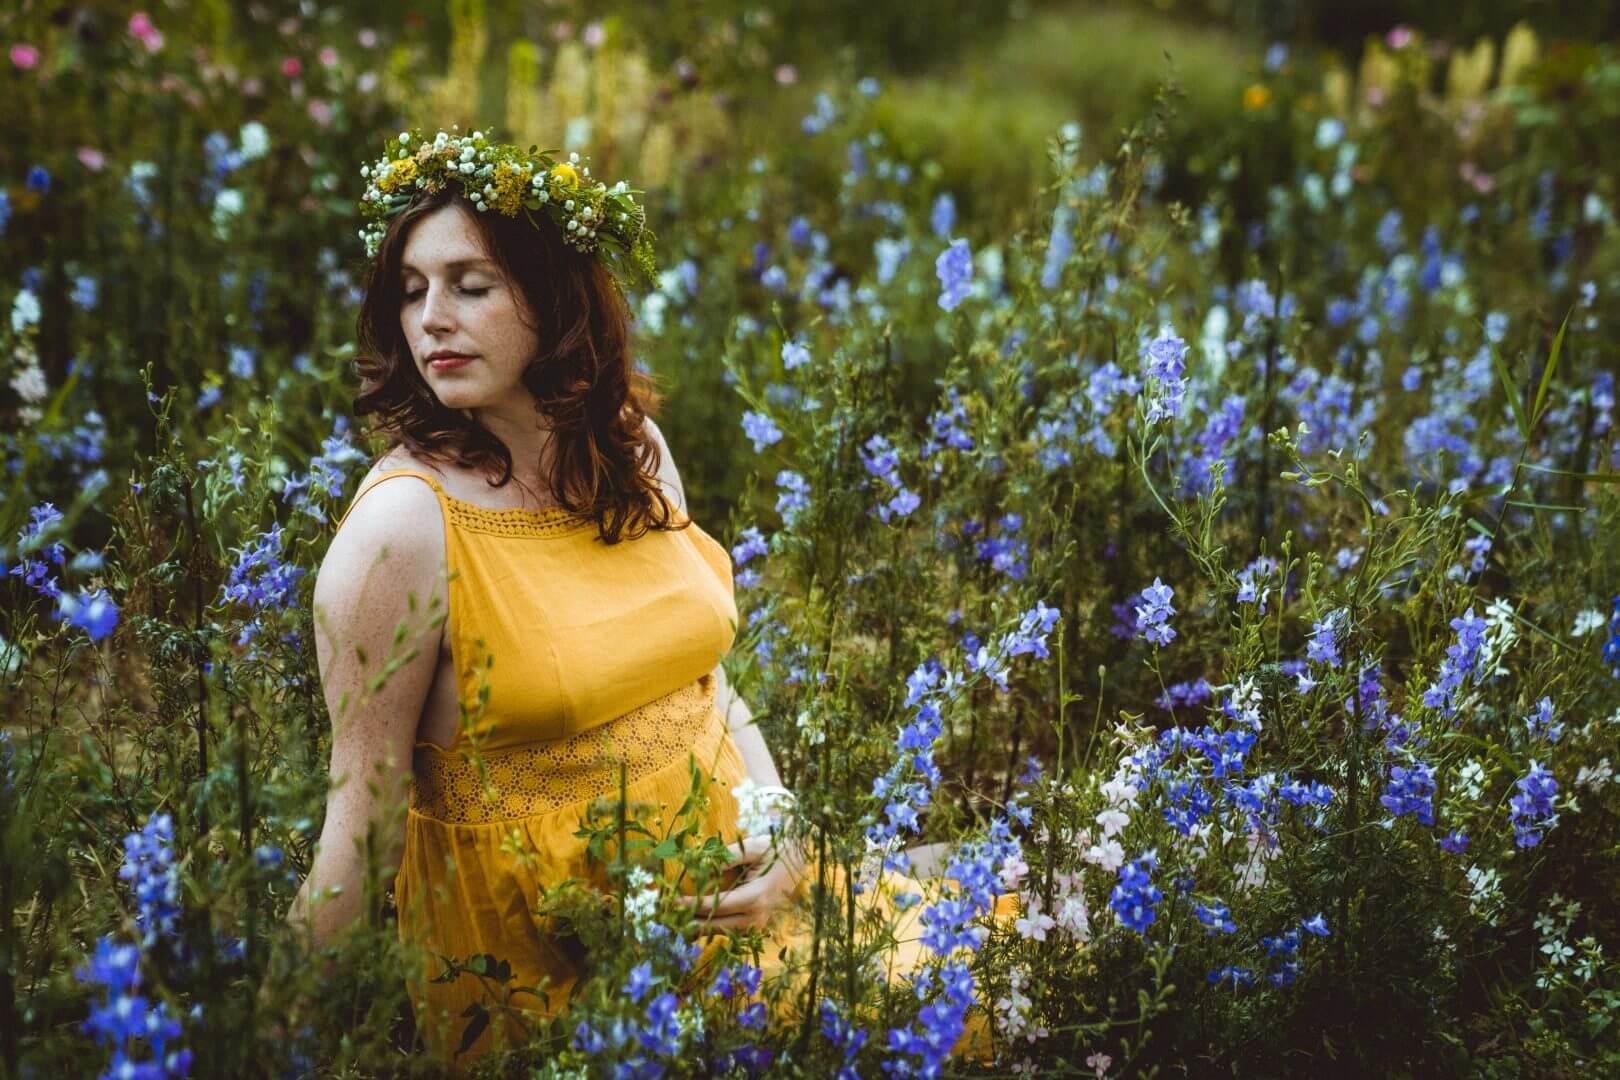 Schwangere in orangenem Kleid in blauem Blumenfeld